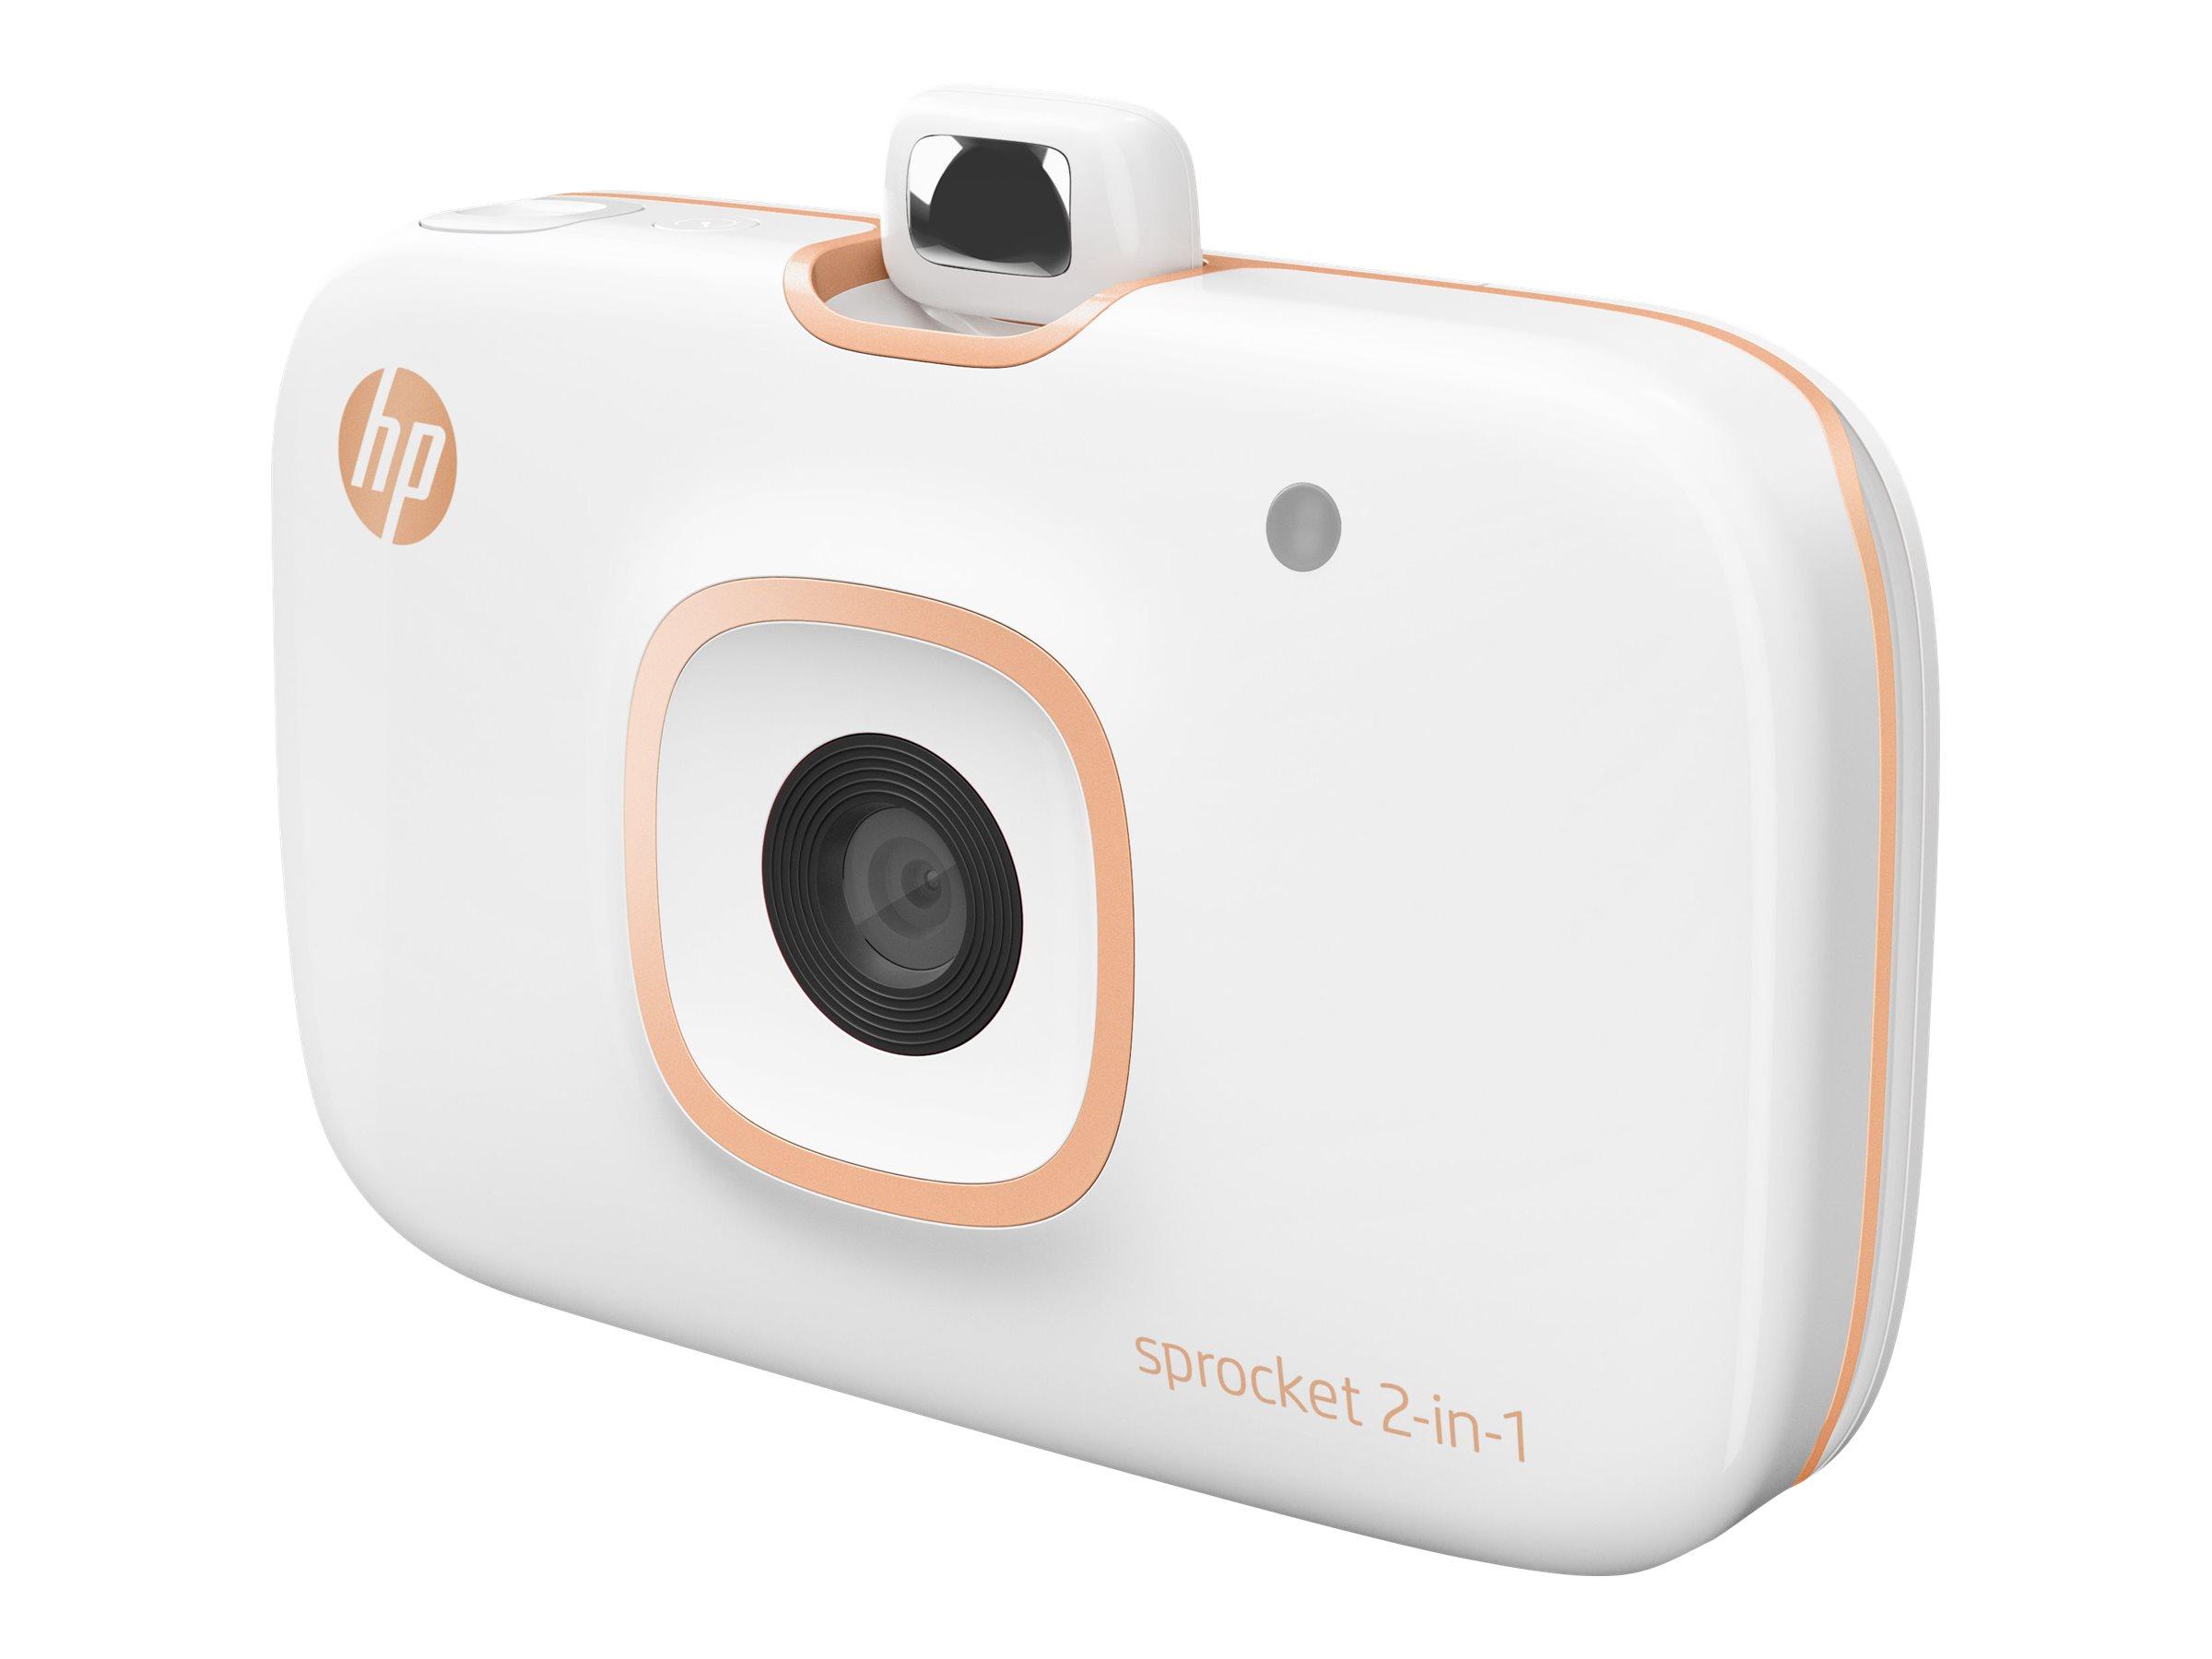 HP Sprocket 2-in-1 - Digitalkamera - Kompaktkamera mit PhotoPrinter - 5.0 MPix - Bluetooth - weiss